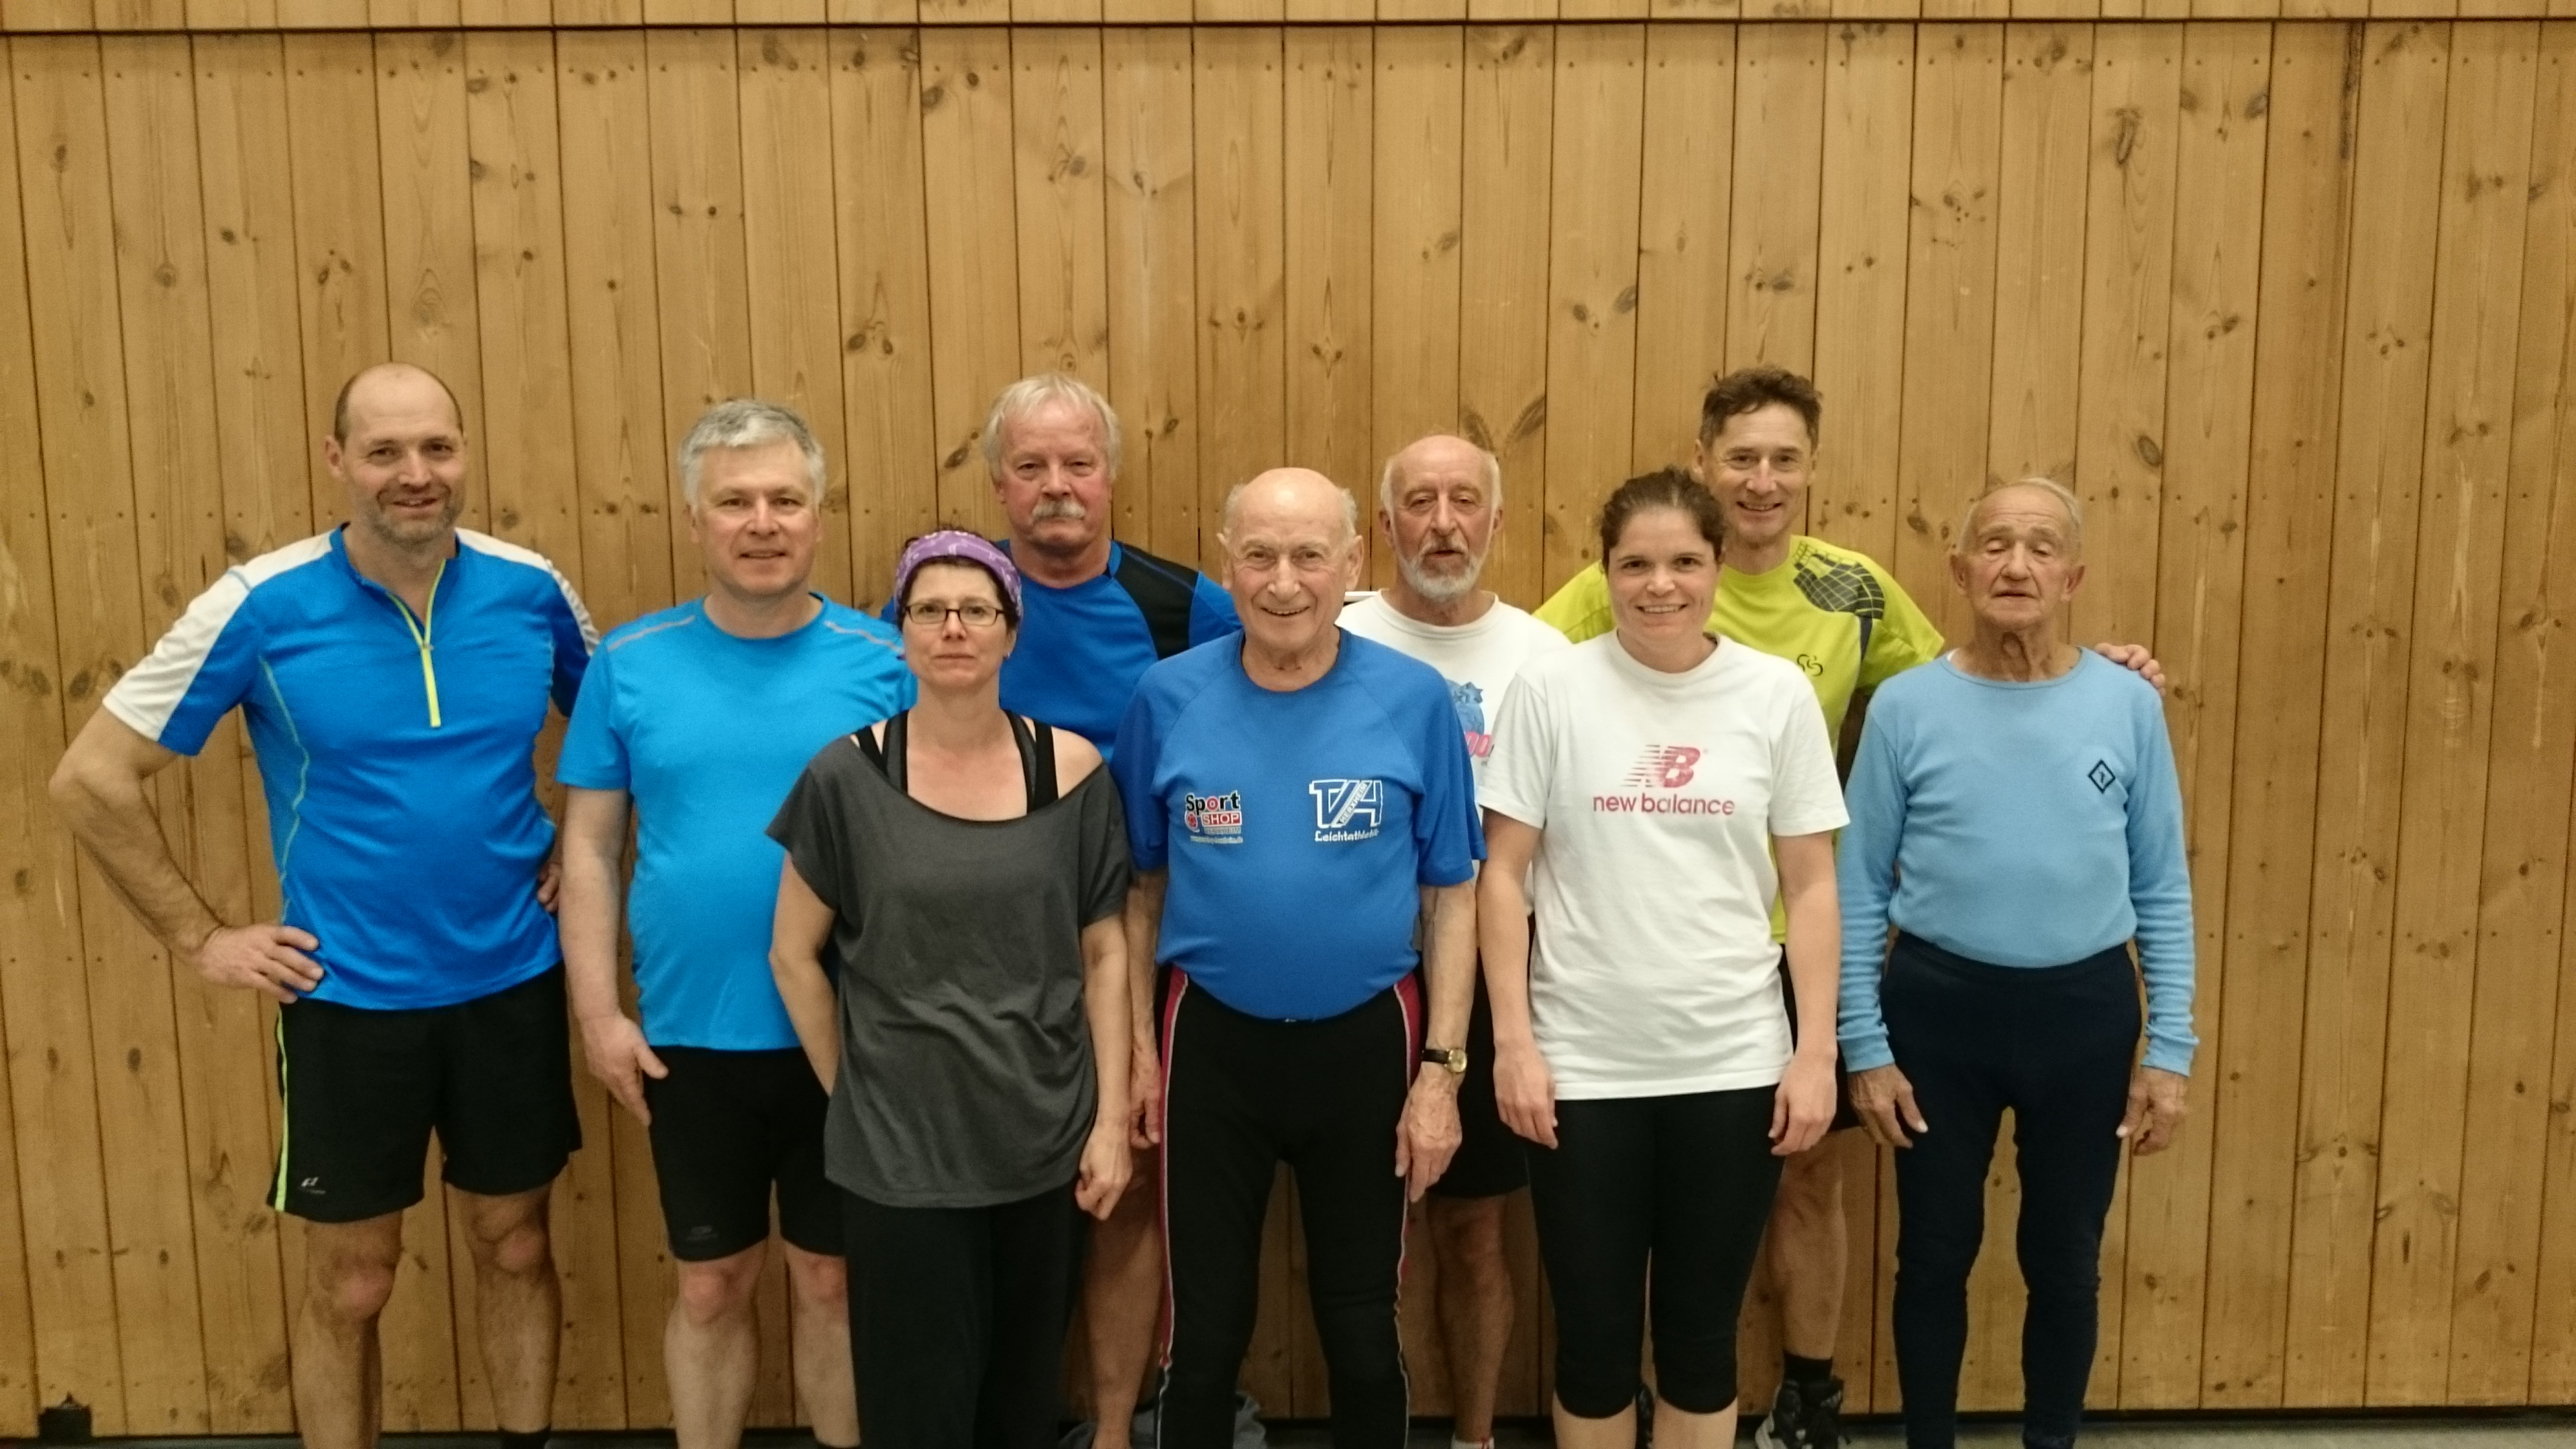 trainingsgruppe_sportabzeichen.jpg